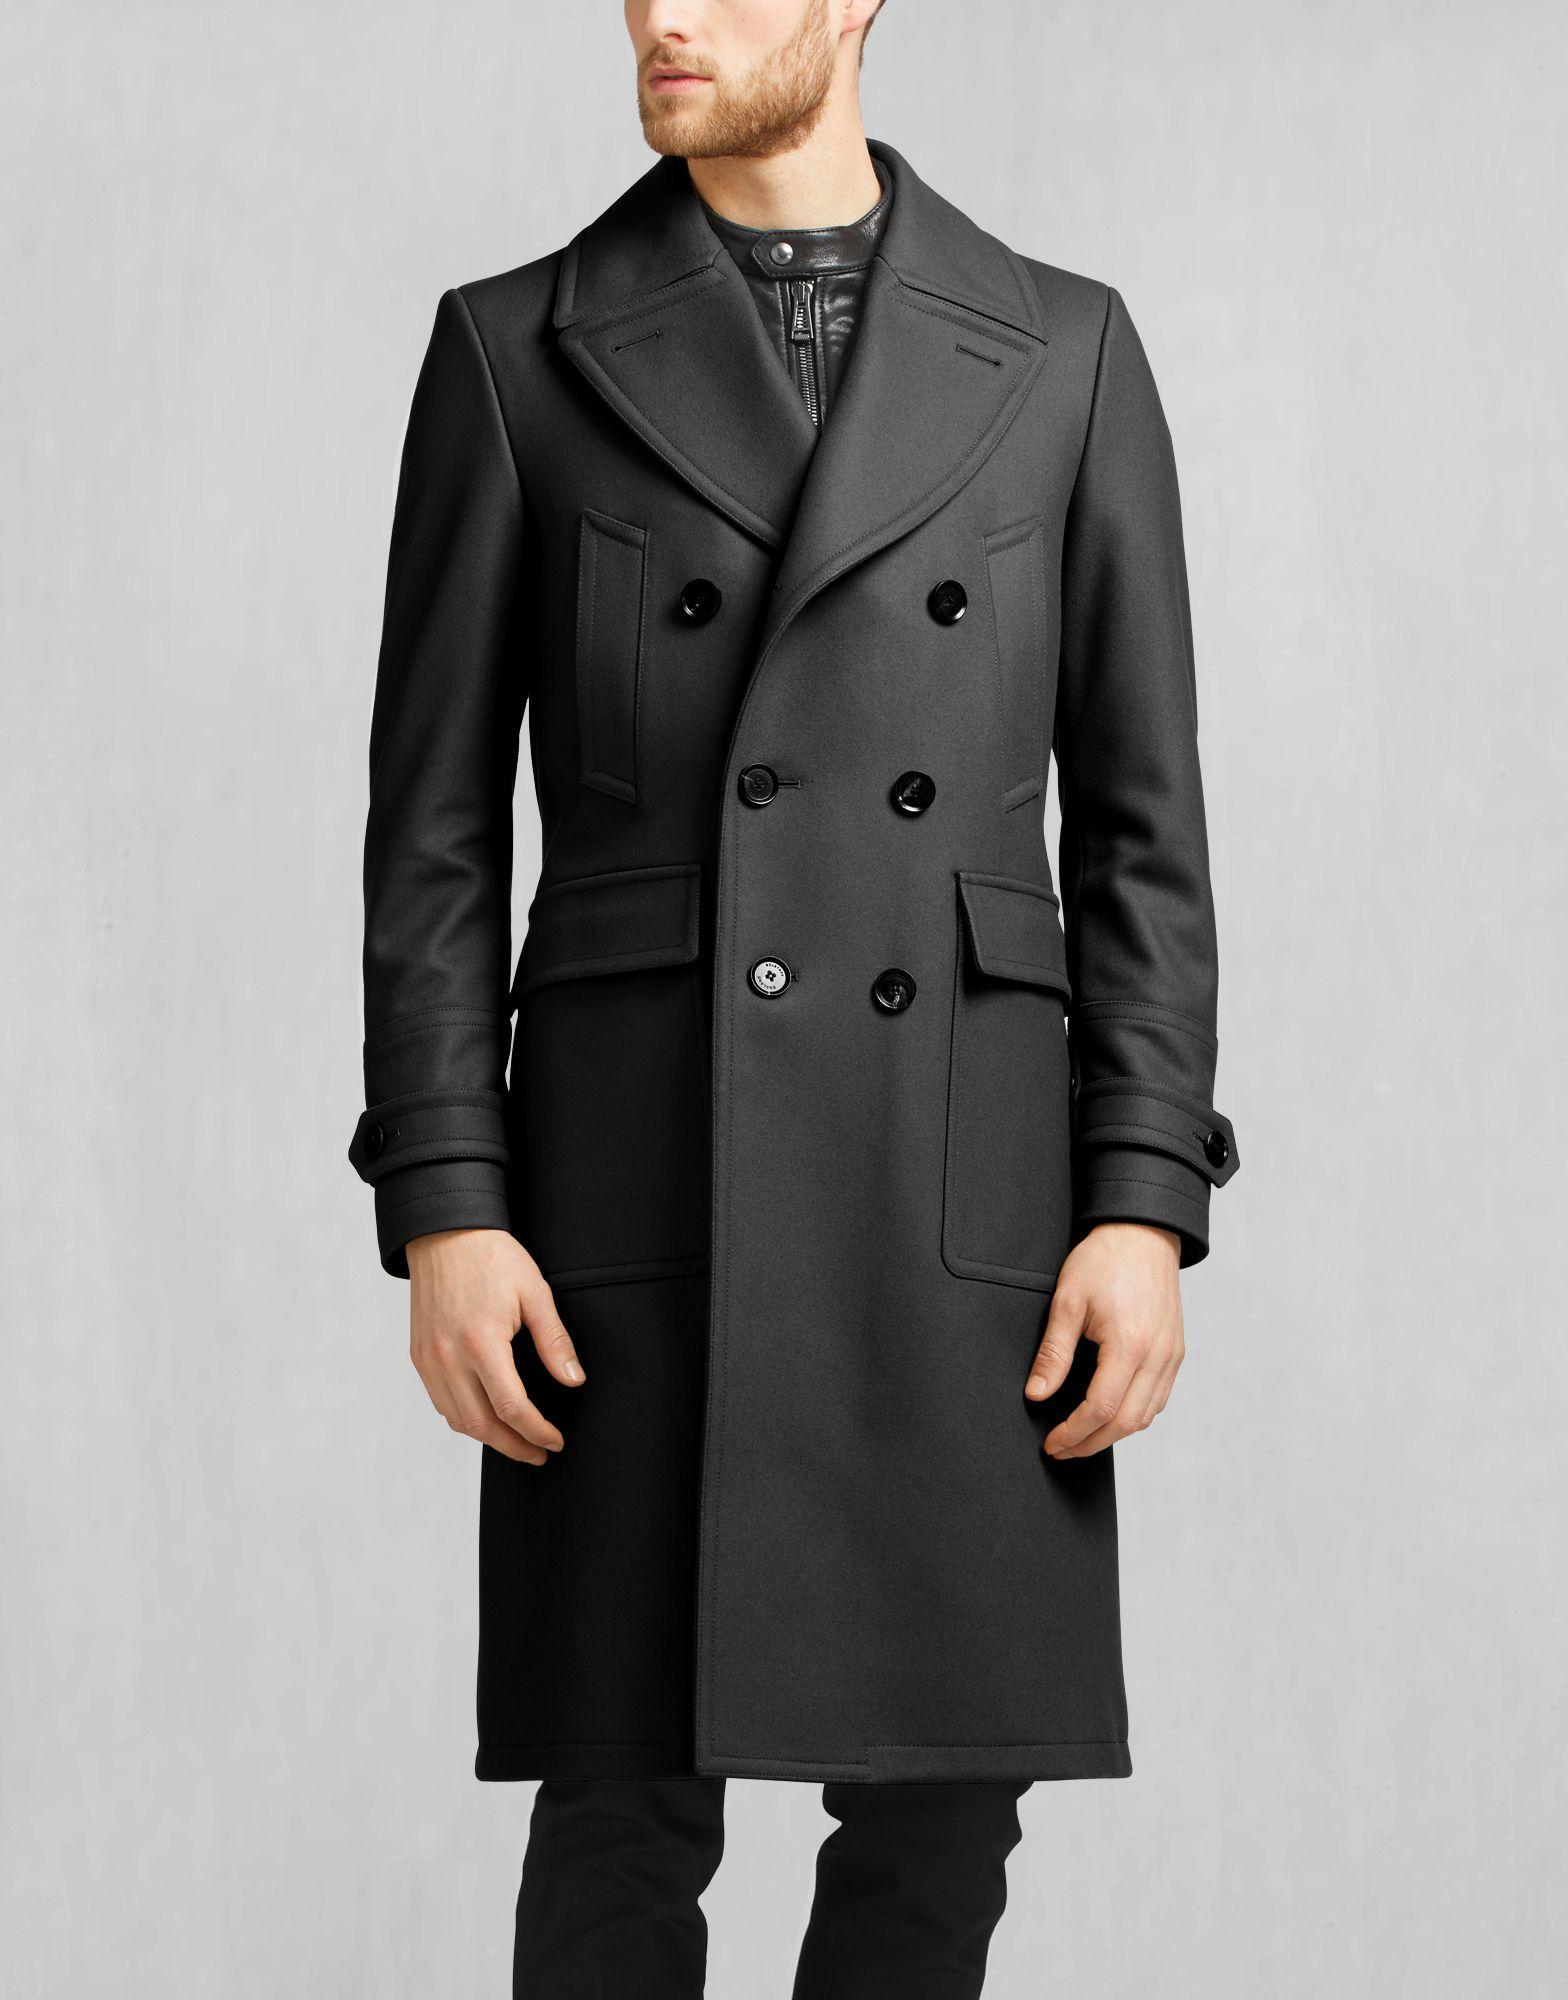 5251ae9241 New Milford | Winter coat | Coat, Belstaff, Winter Coat